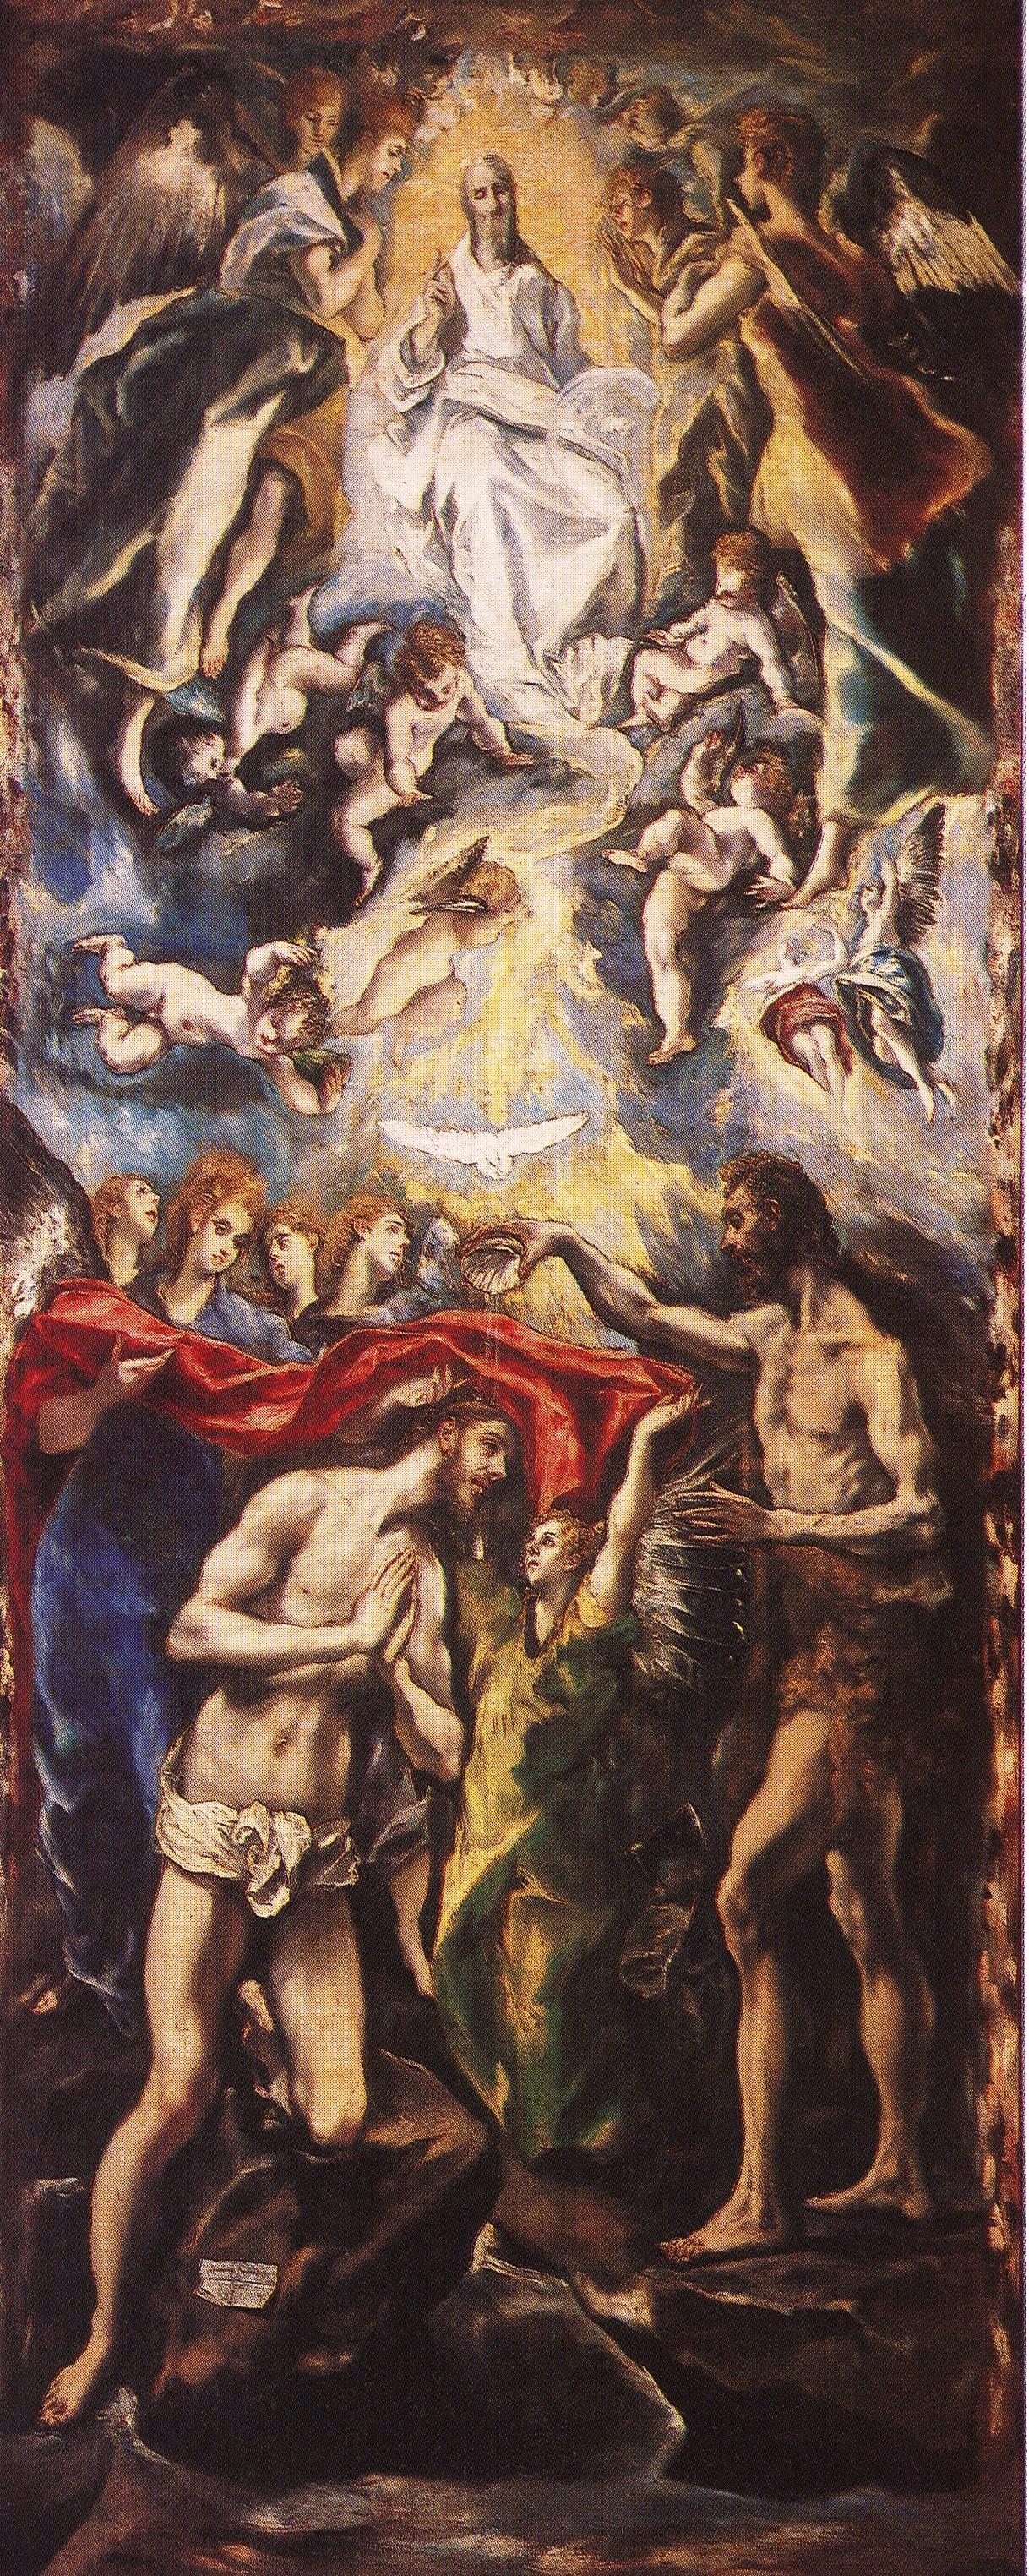 https://i1.wp.com/upload.wikimedia.org/wikipedia/commons/1/14/Greco_Bautismo_de_Cristo_1597.jpg